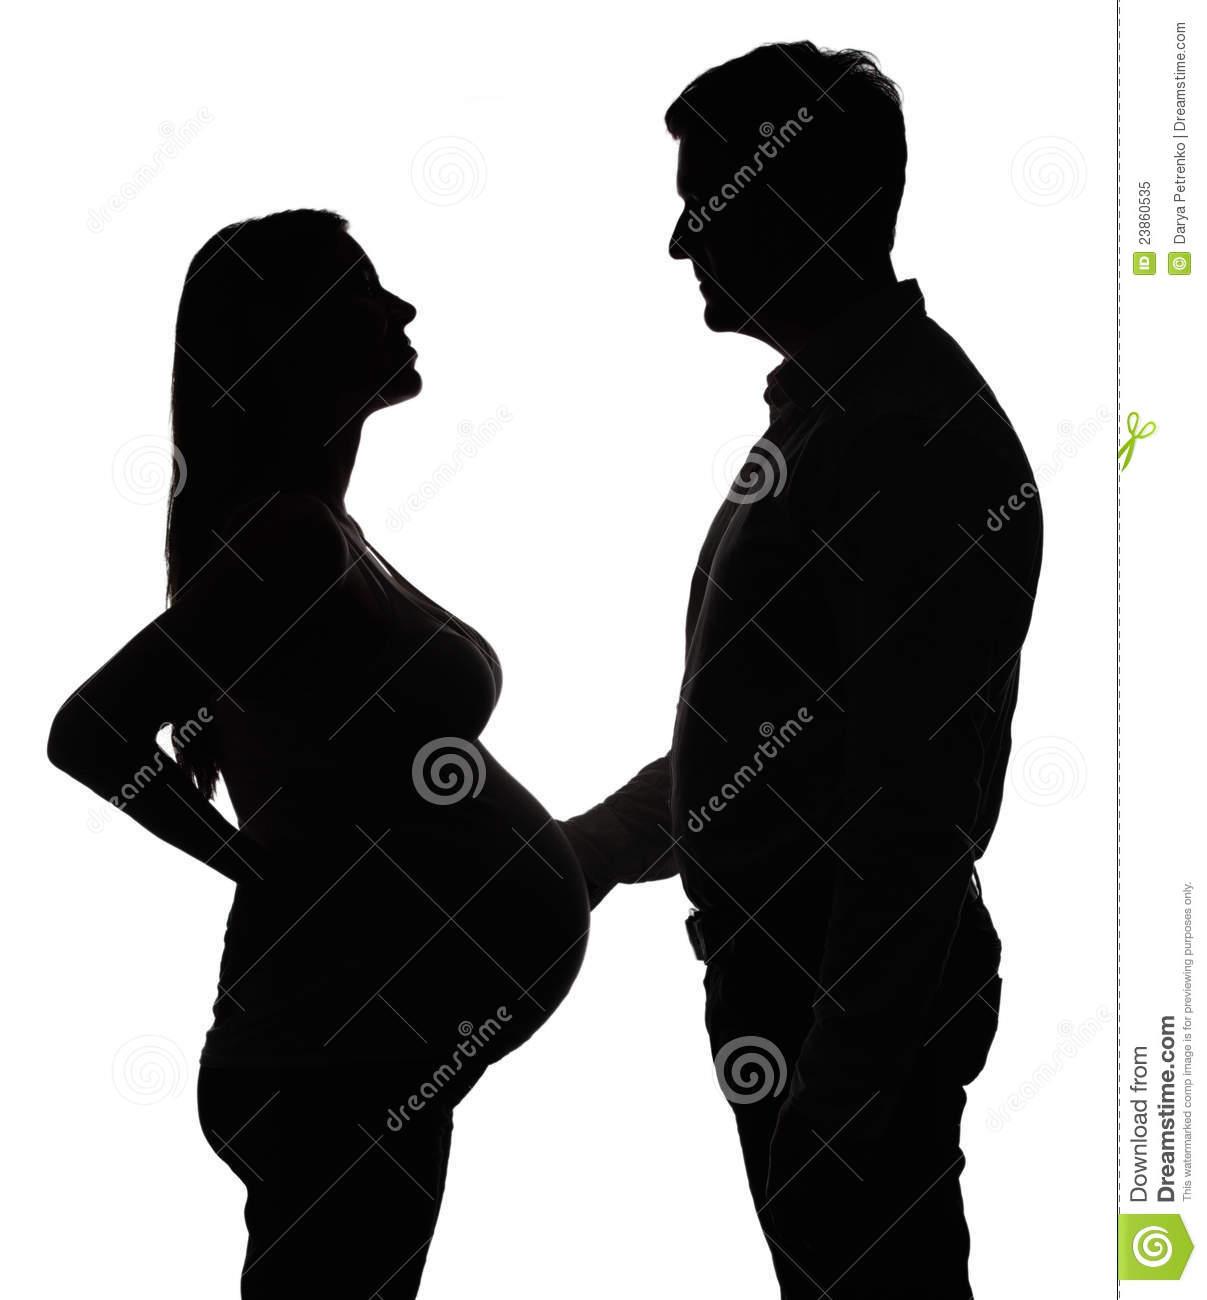 Kopel clipart pregnancy Pregnancy Clip Download Couple Clipart